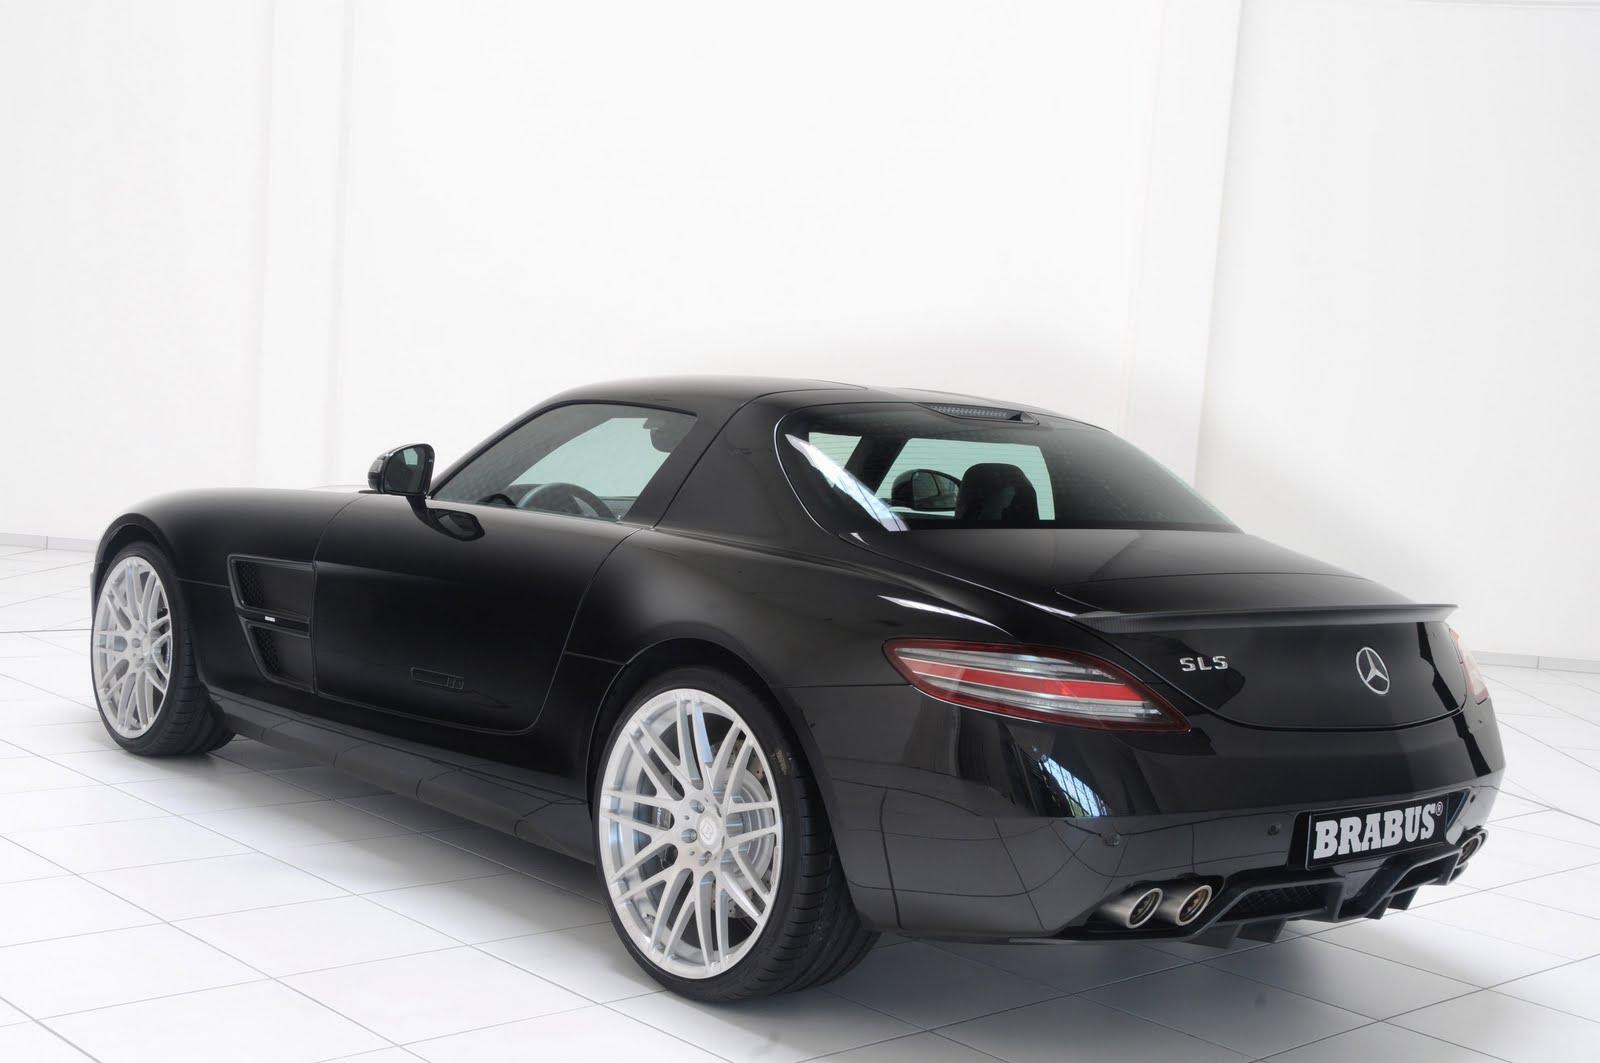 http://4.bp.blogspot.com/_GIlsuSZq_VM/THUxqccX_-I/AAAAAAAAk24/zmaxGgcGfEQ/s1600/BRABUS+Mercedes-Benz+SLS+AMG+1.jpg